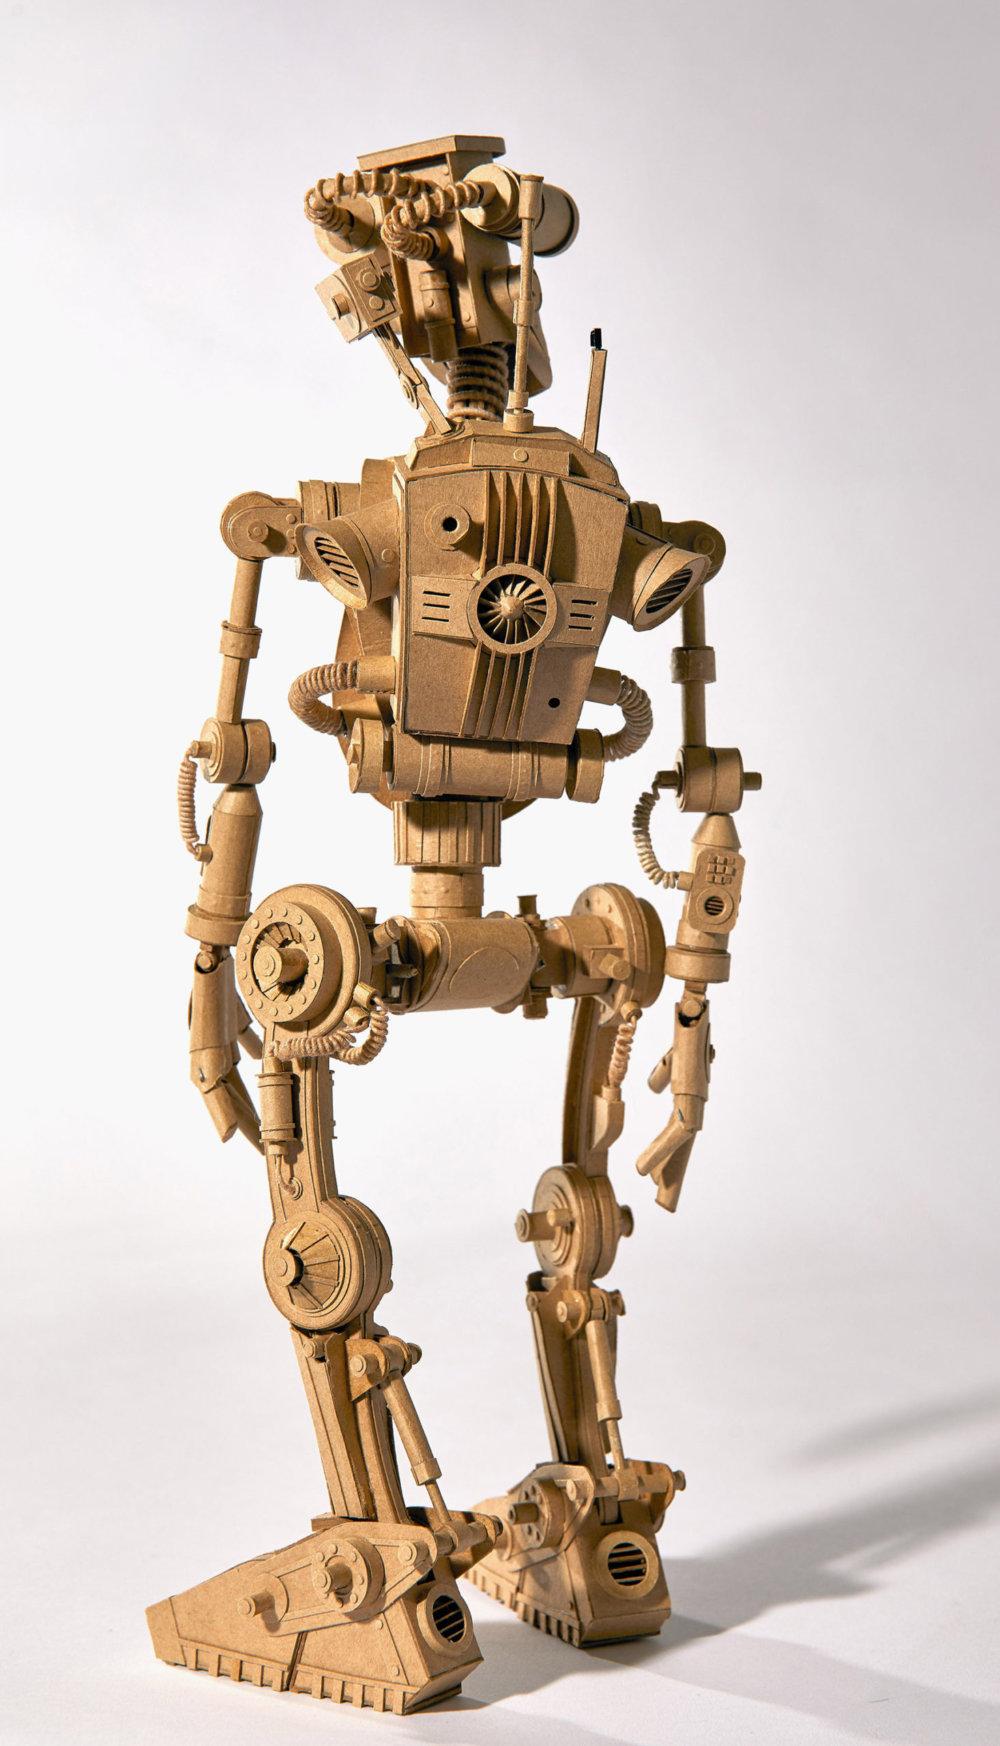 Amazingly Intricate Robot Cardboard Sculptures By Greg Olijnyk 8